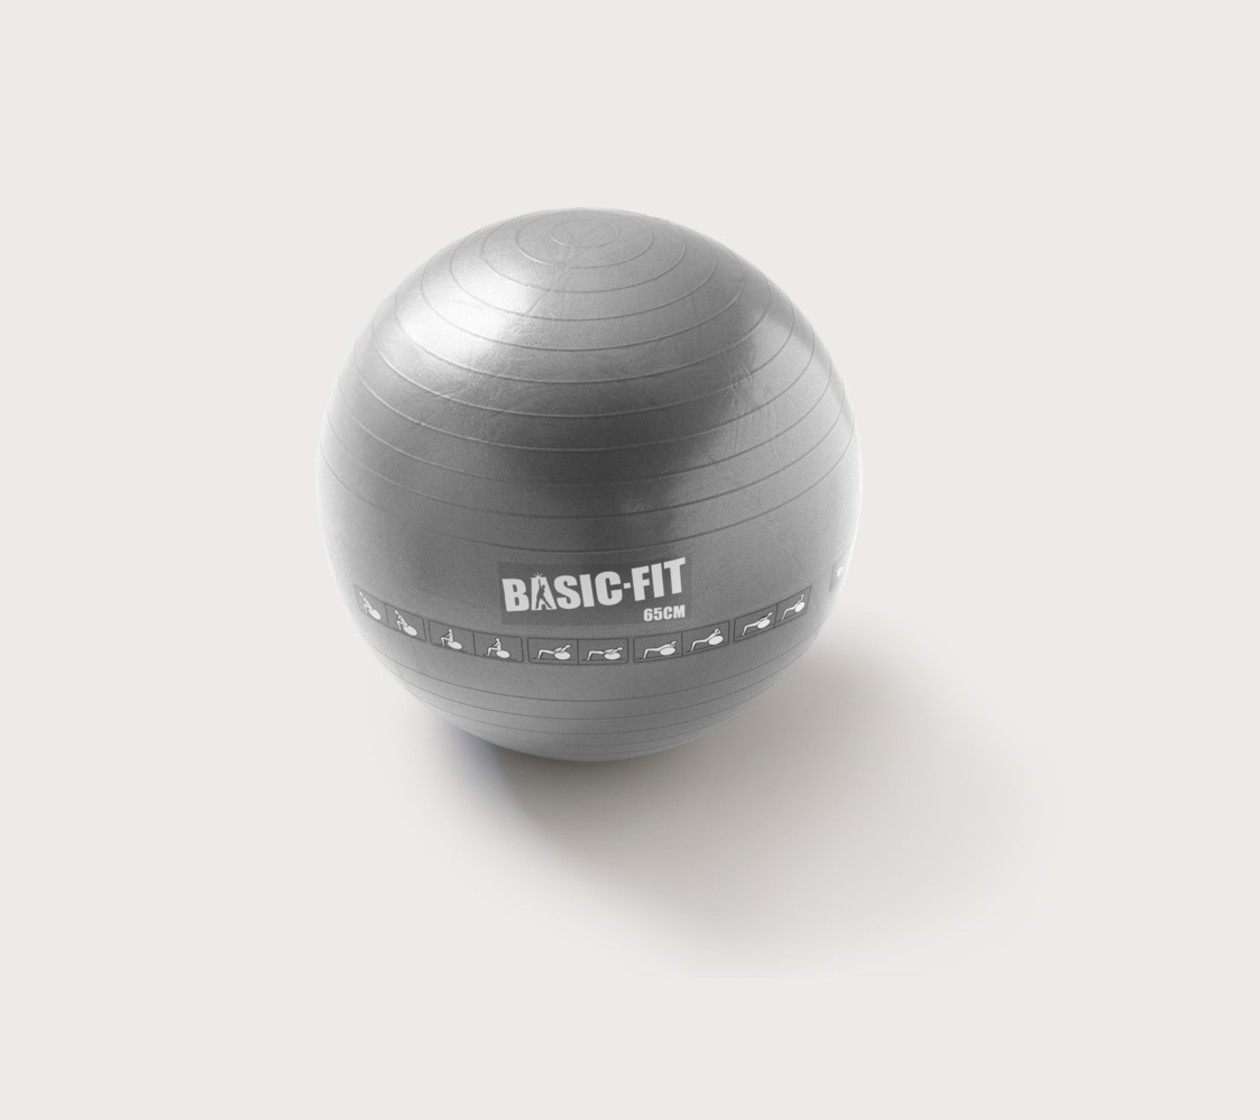 Light home workout bundle